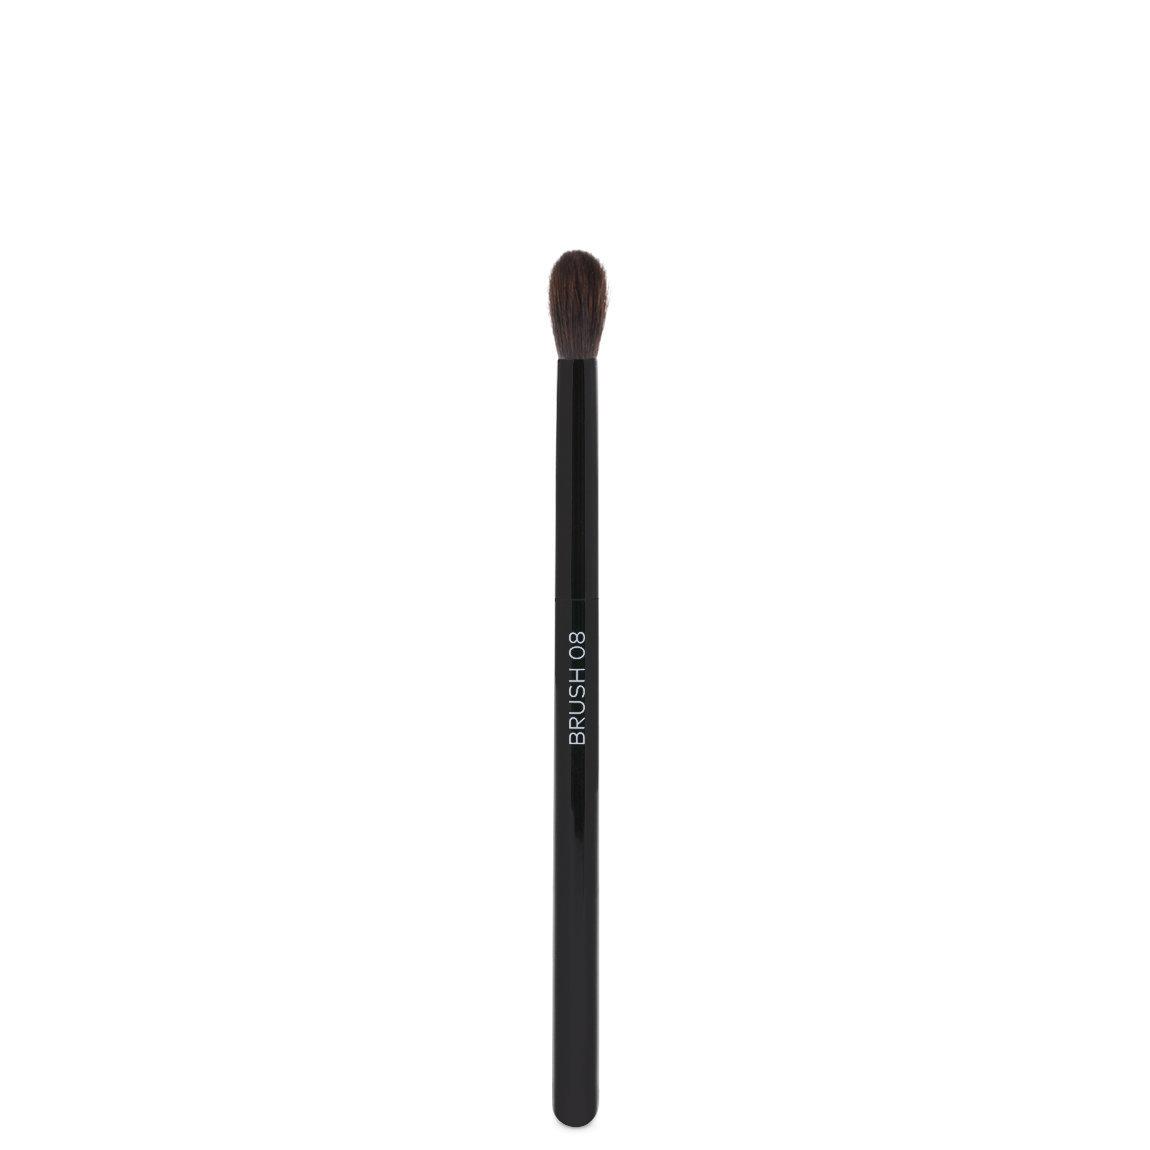 Beautylish Presents Yano Series Brush 08 Blending alternative view 1 - product swatch.